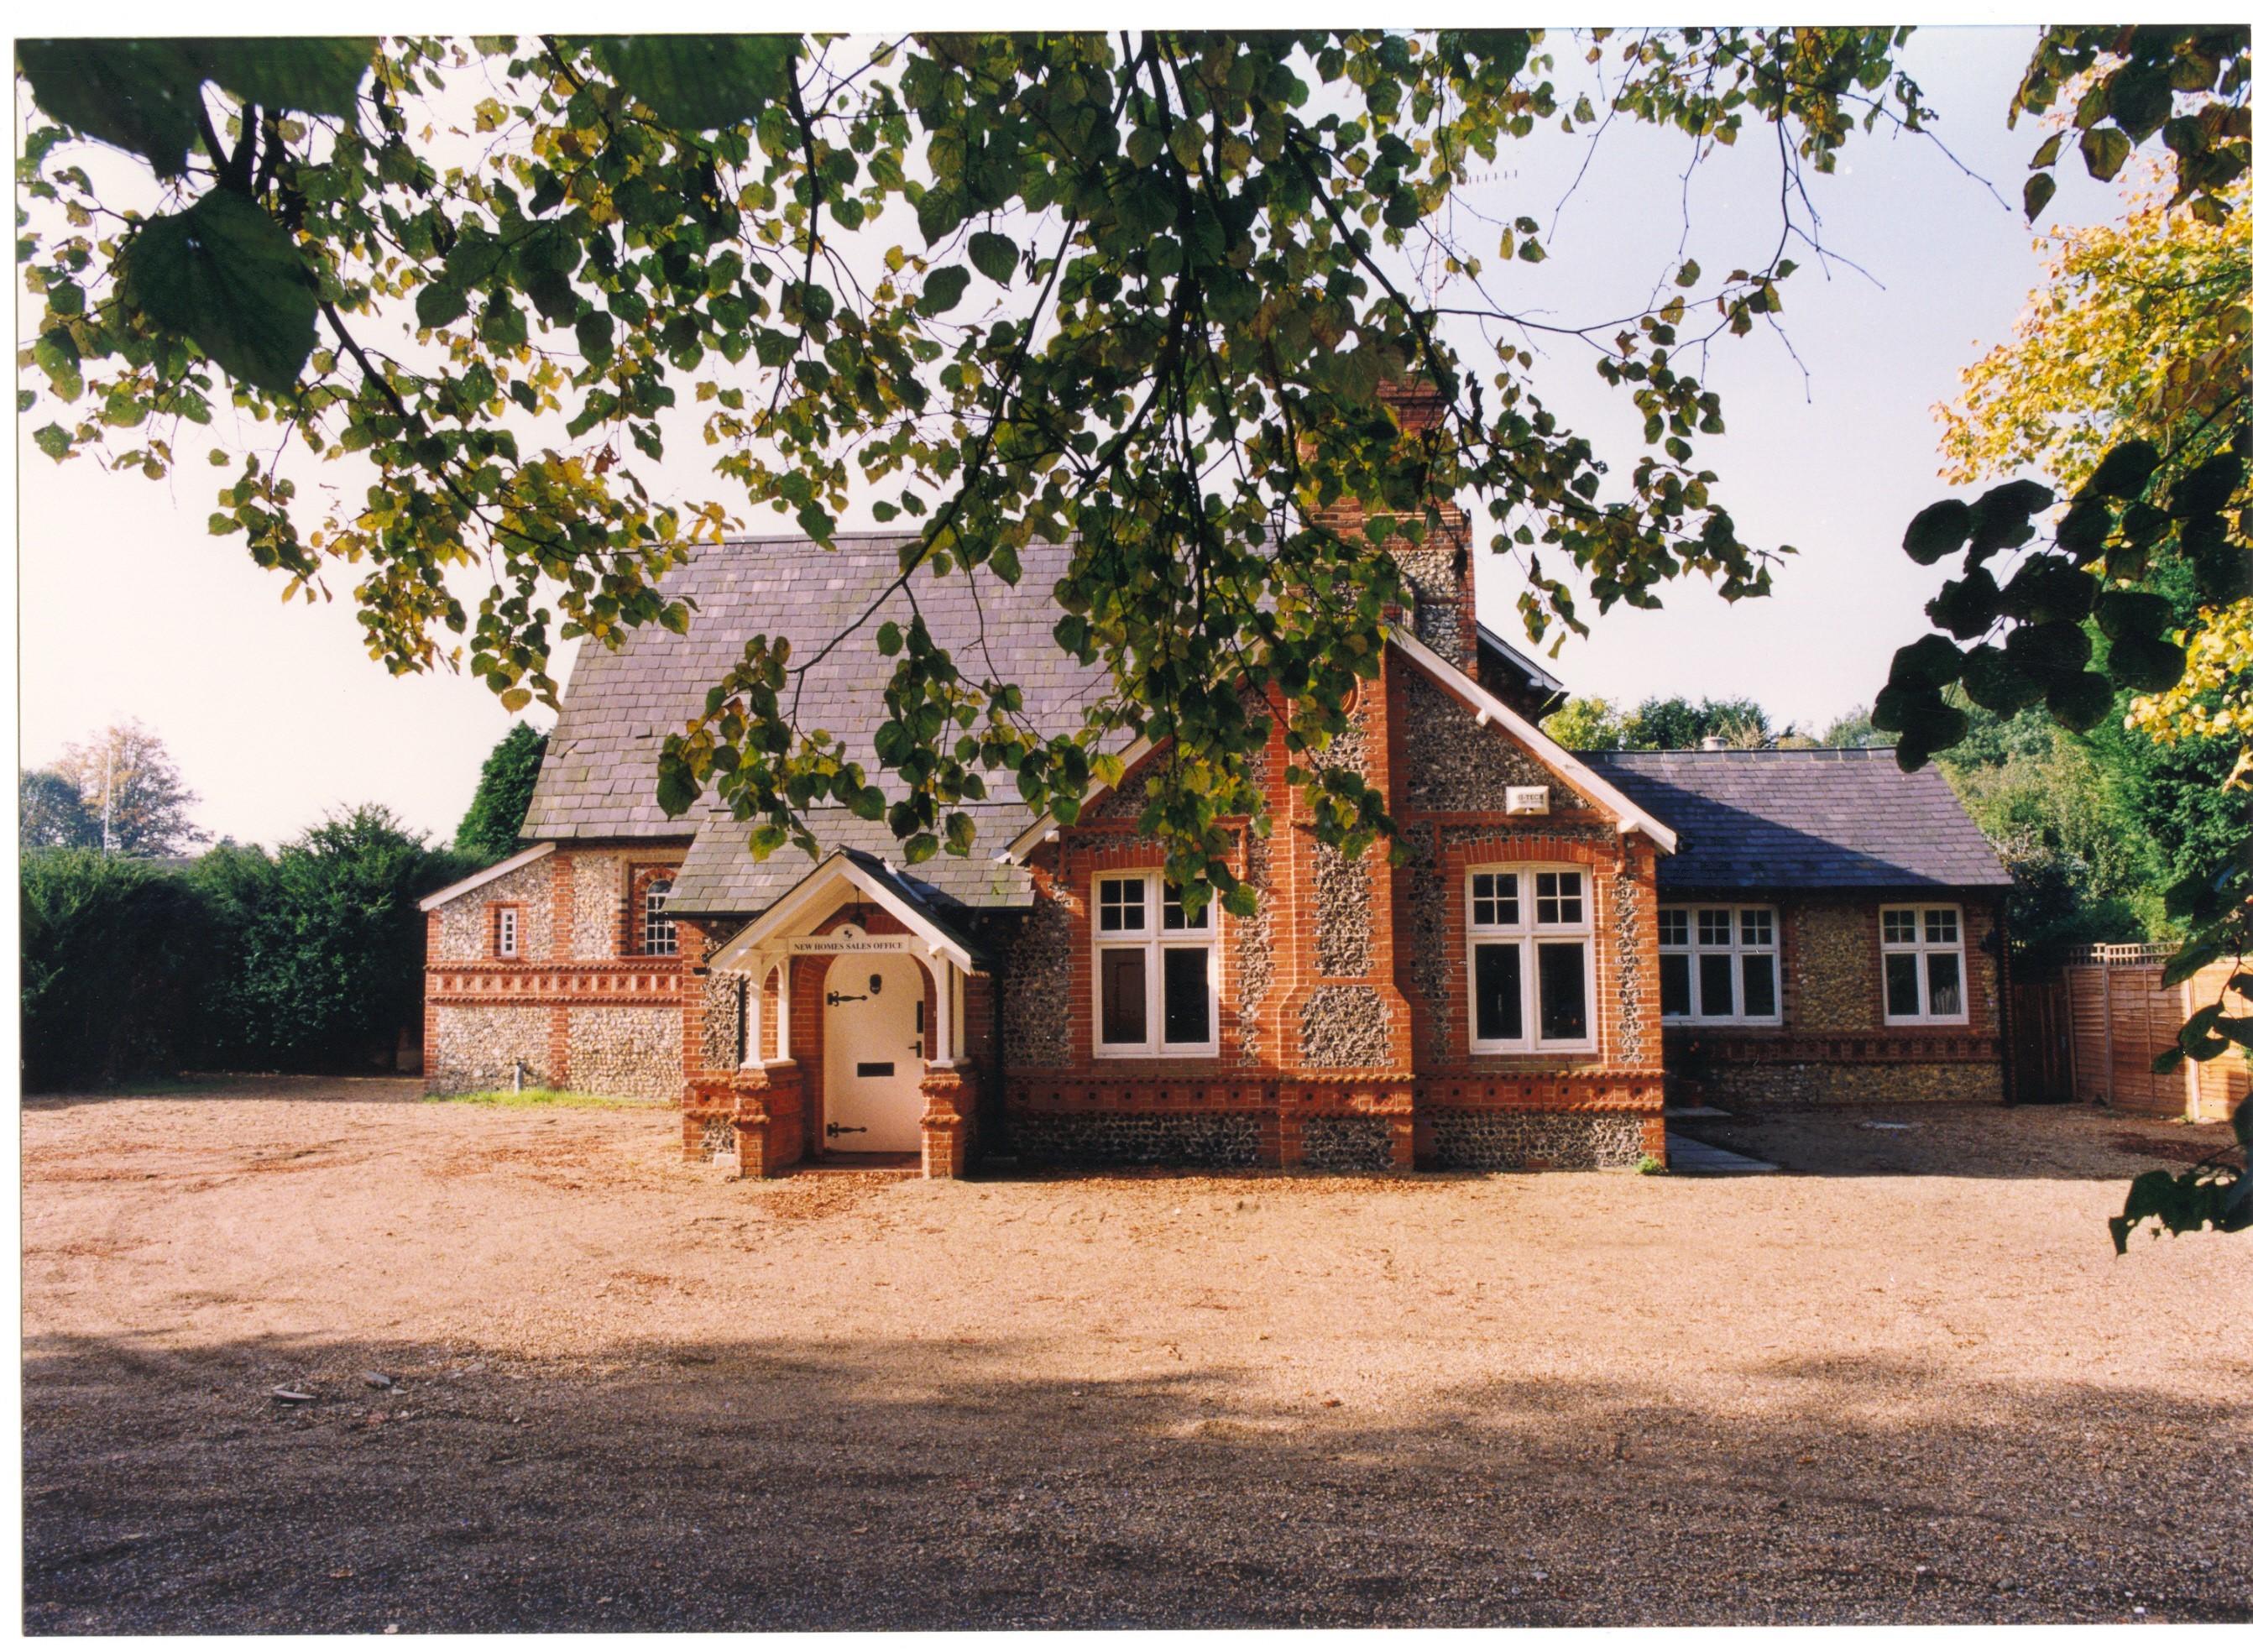 East Horsley, Surrey